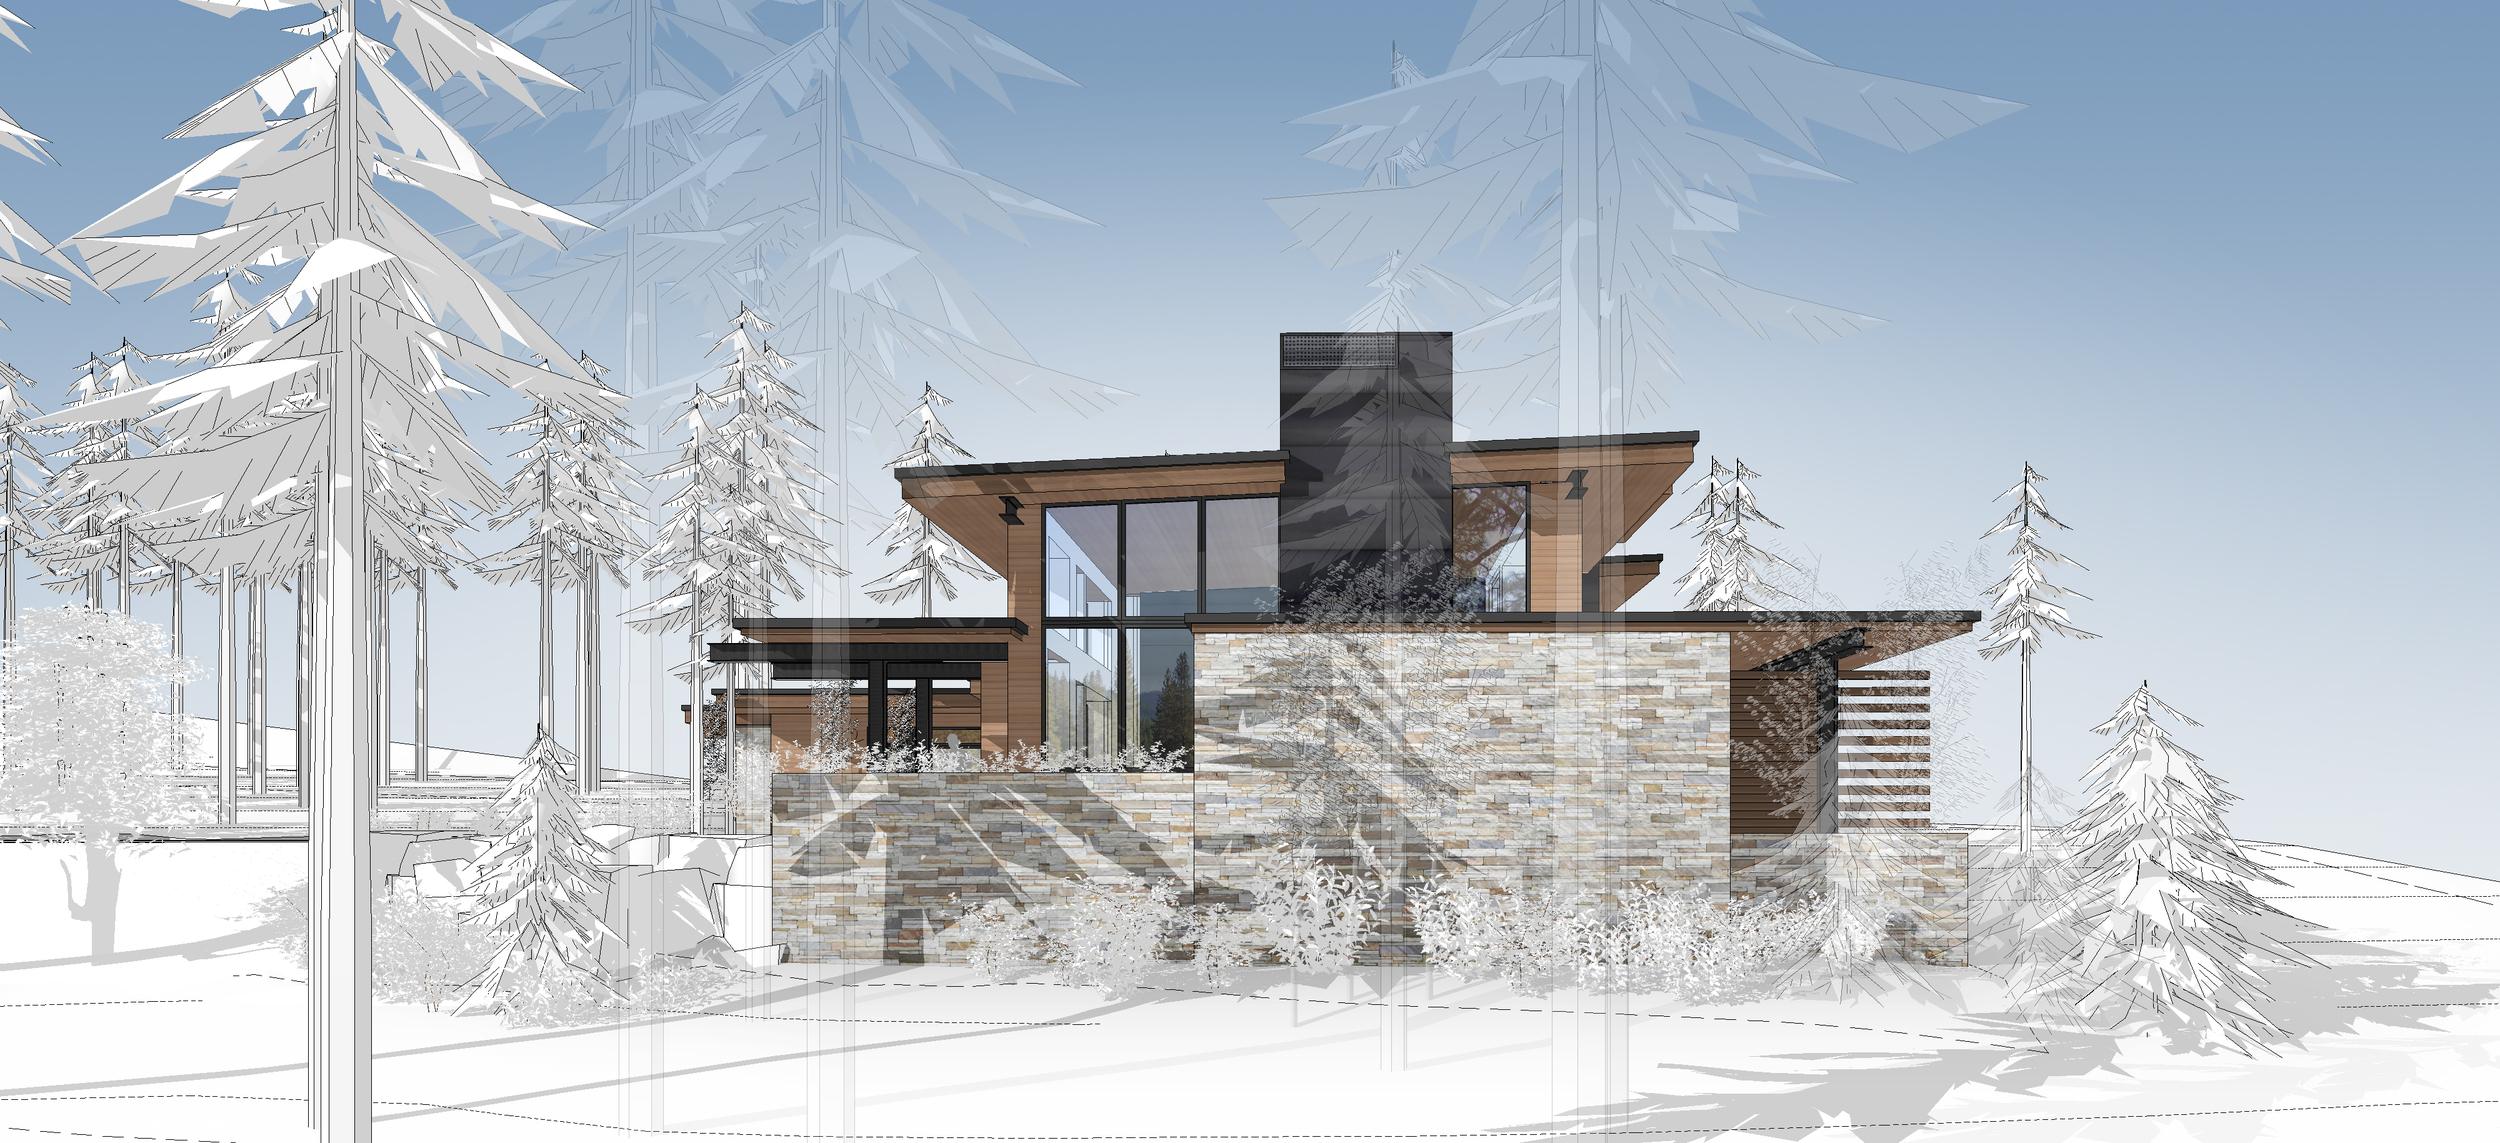 Contractor: Lamperti Construction   Square Footage: 4,402 sf bedrooms: 4 bathrooms: 4.5